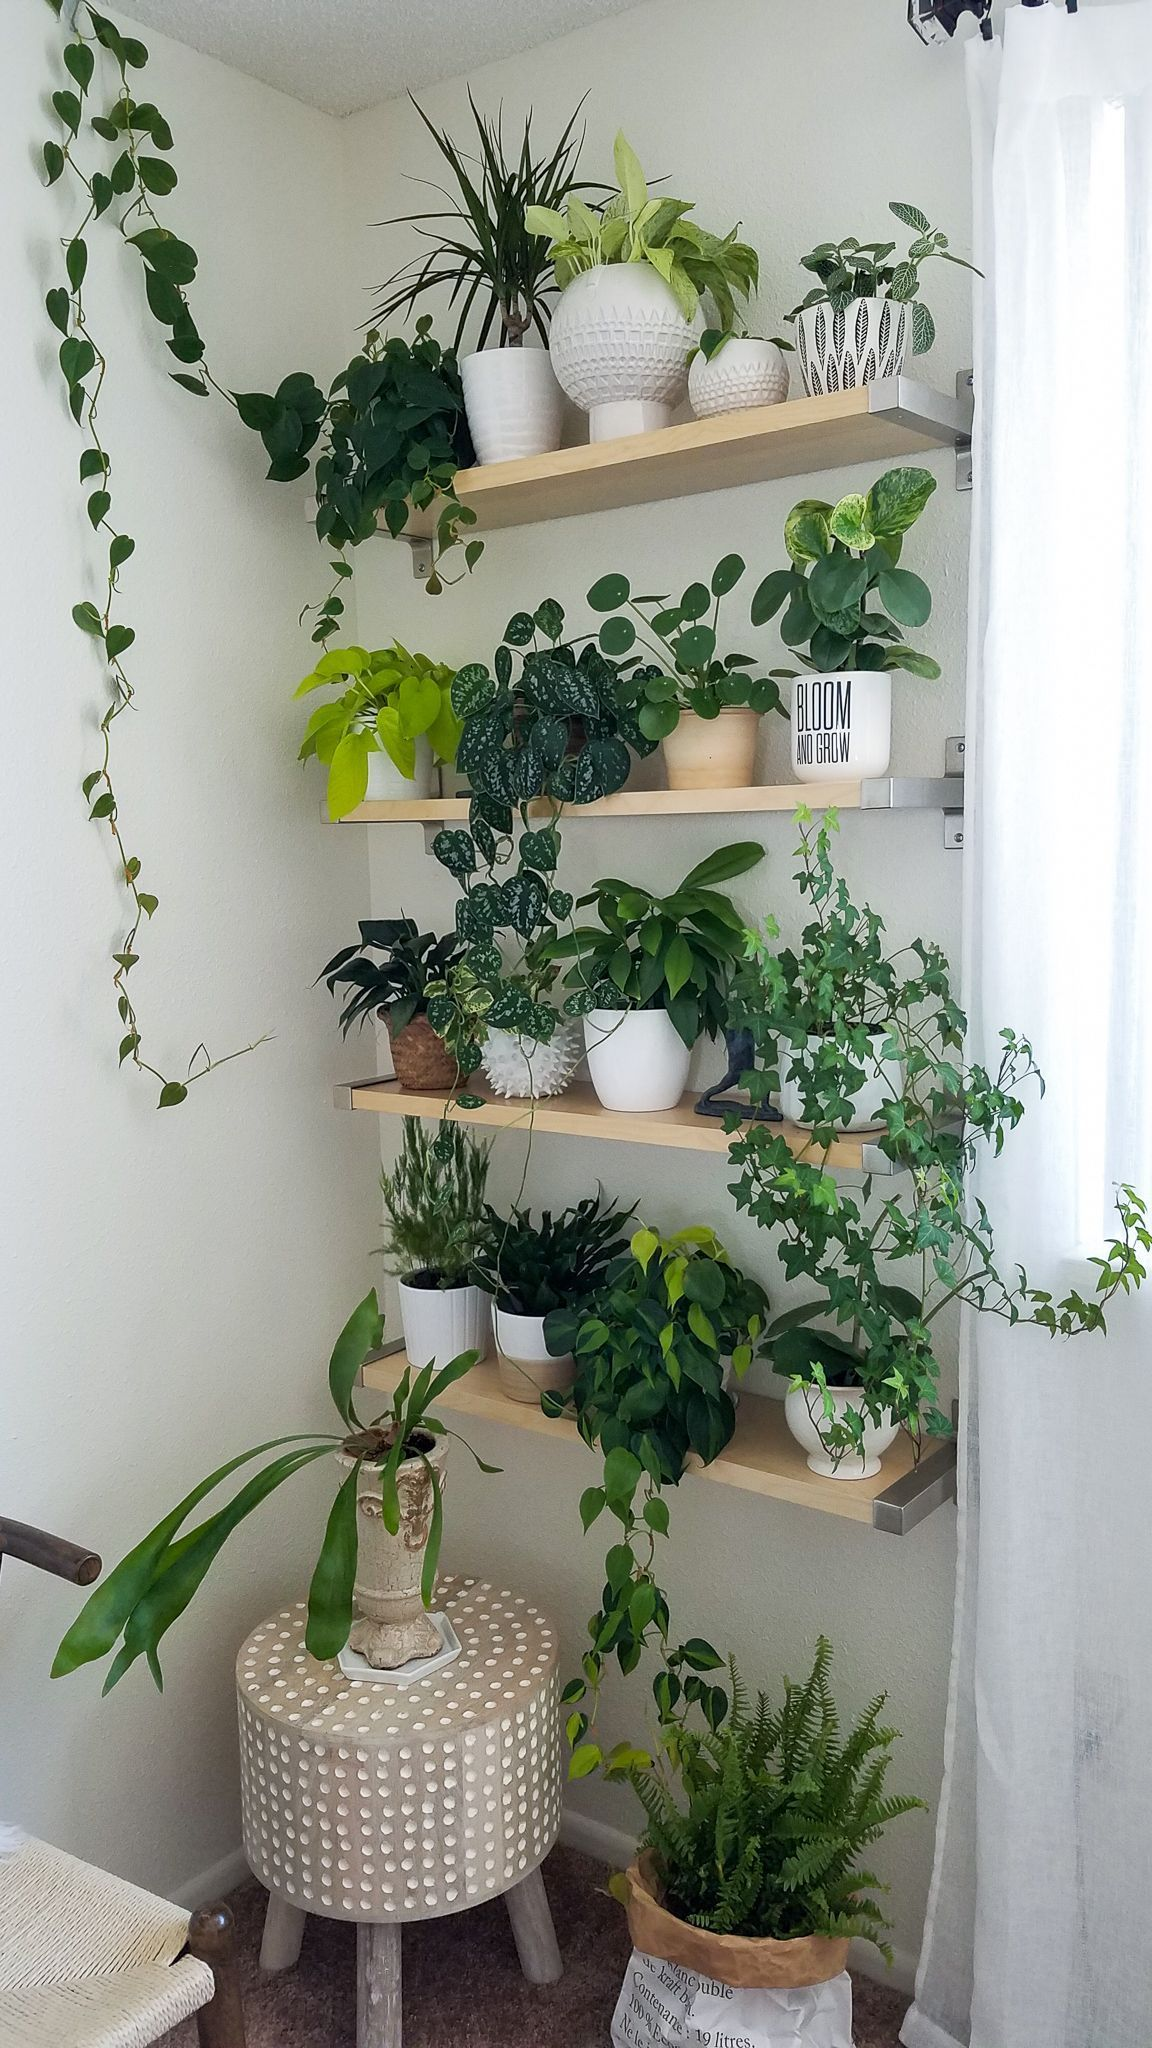 Plant wall houseplants decorating with plants shelves pots apartment ideas artificialplantslivingroom also amazing indoor garden decorations tips and home decor rh pinterest